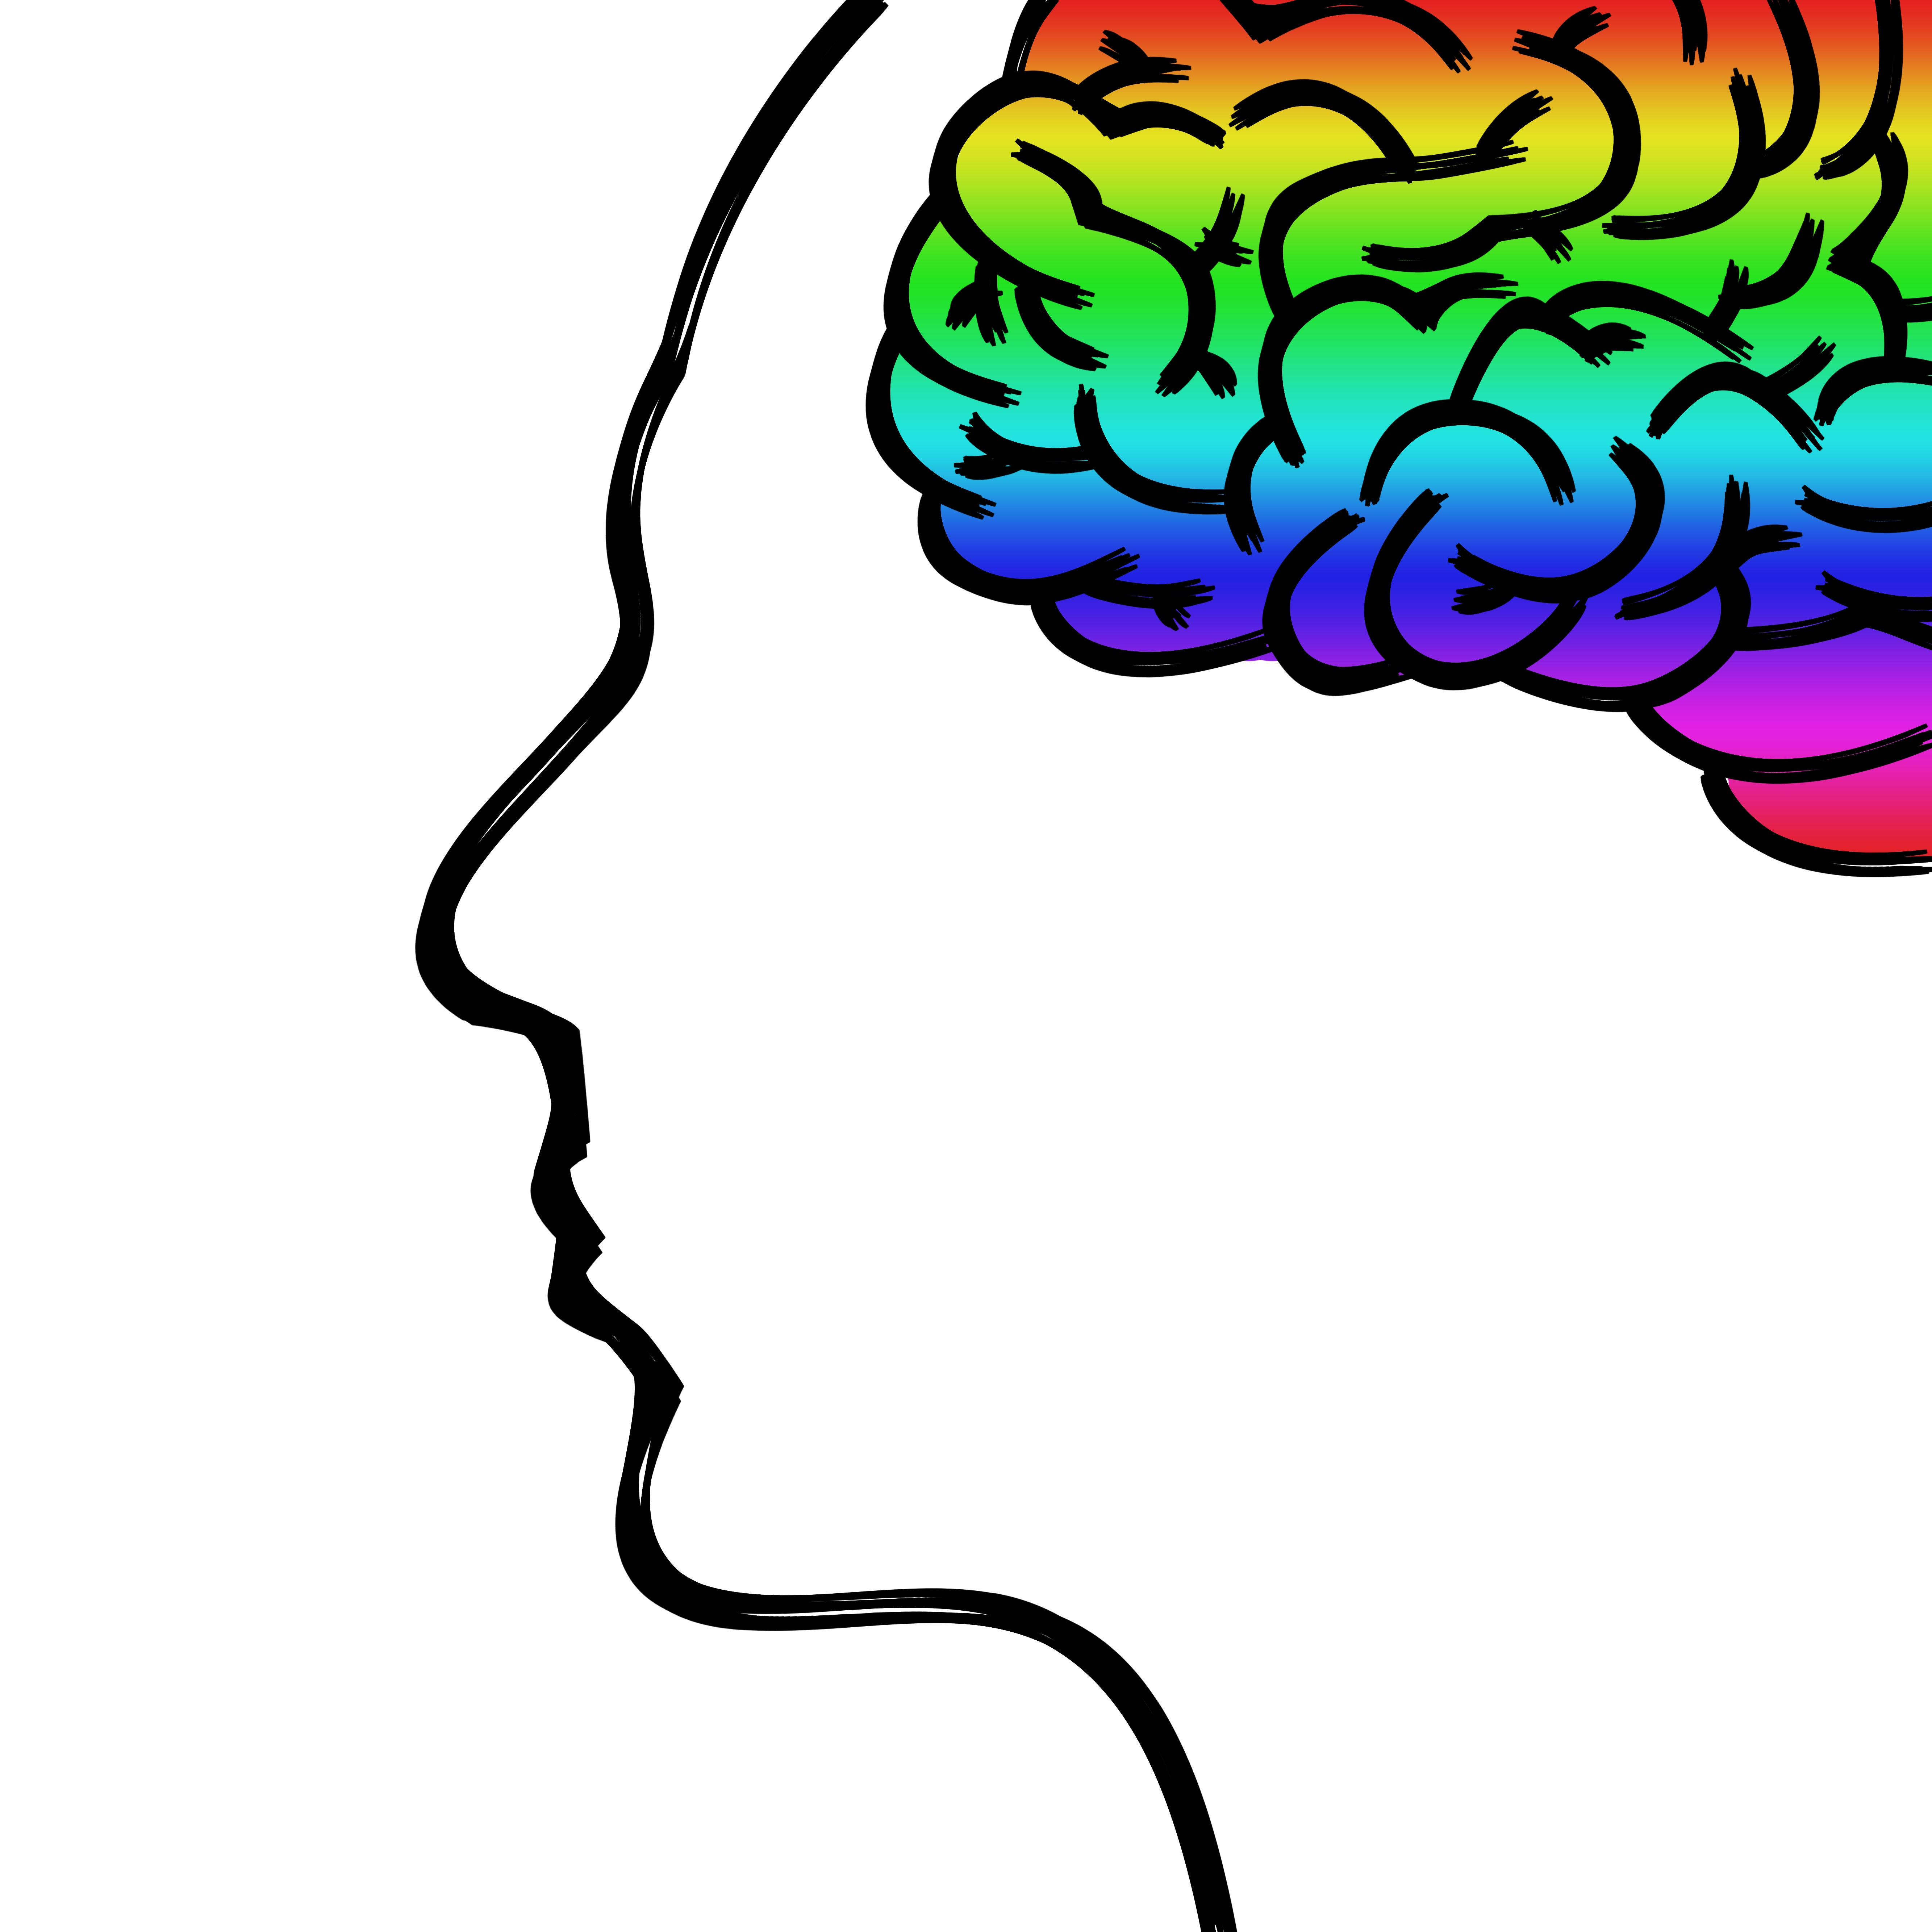 5333x5333 Free Images Human Body, Font, Drawing, Psychology, Head, Brain